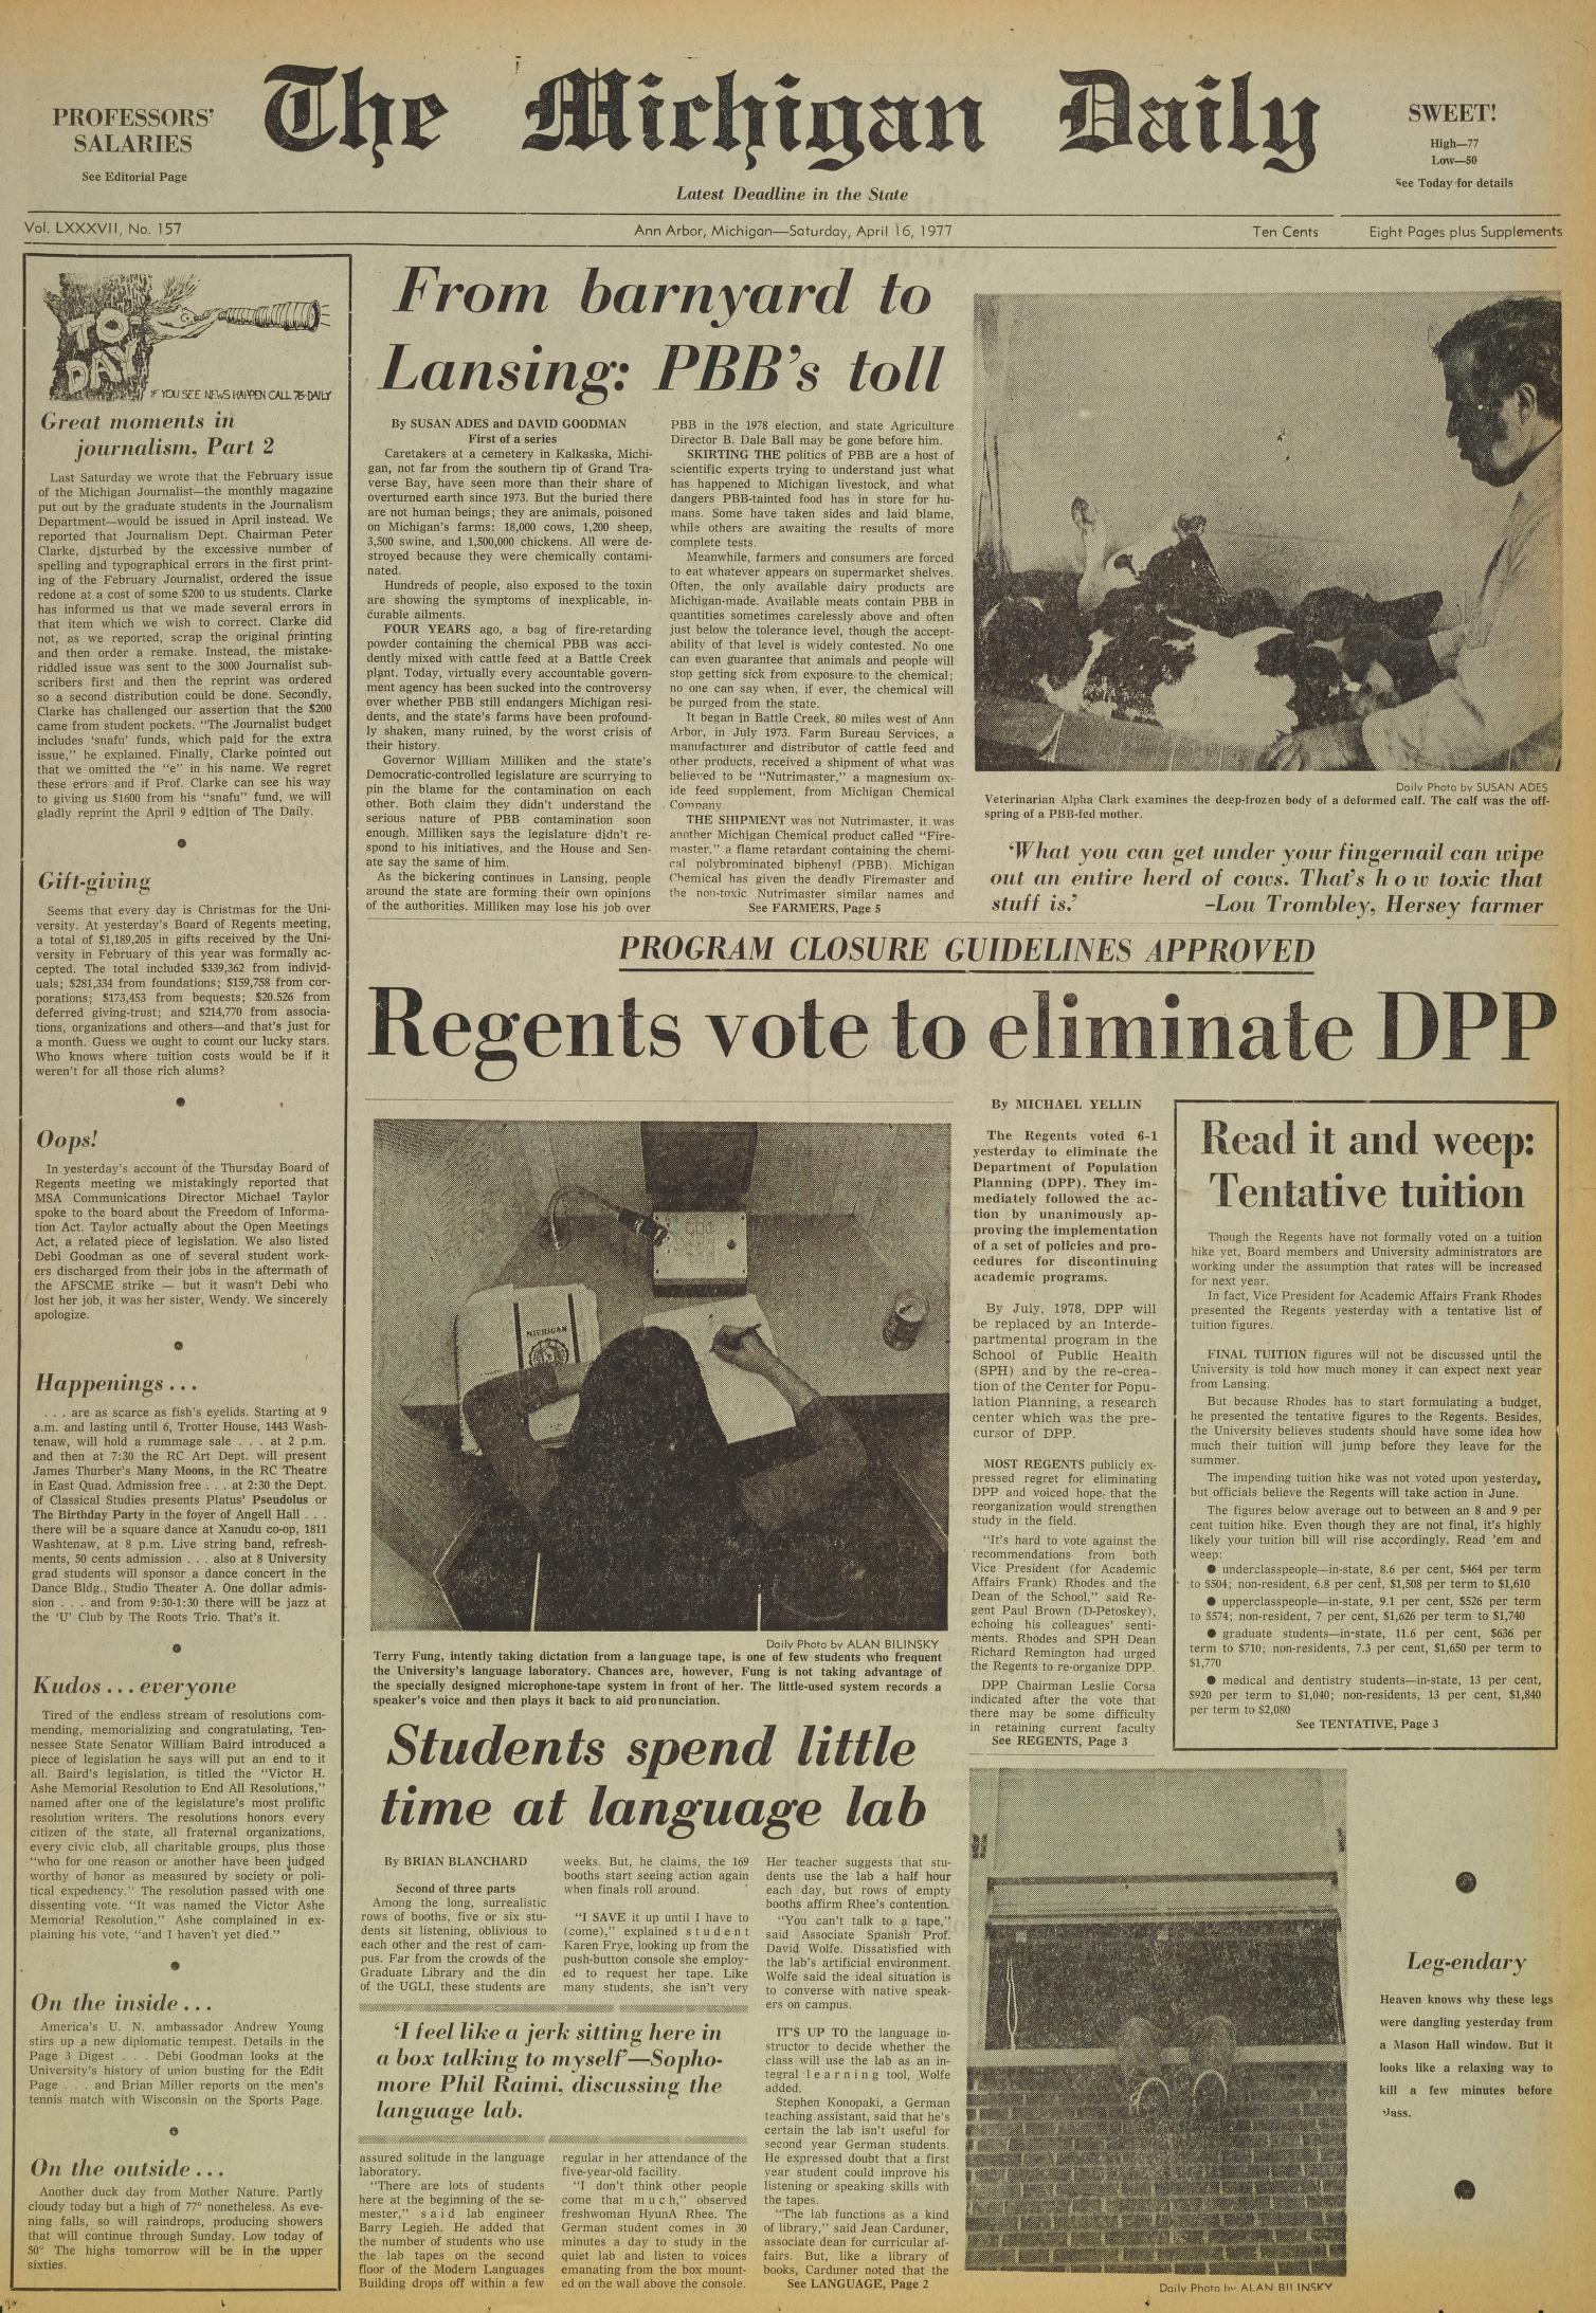 Michigan Daily Digital Archives - April 16, 1977 (vol  87